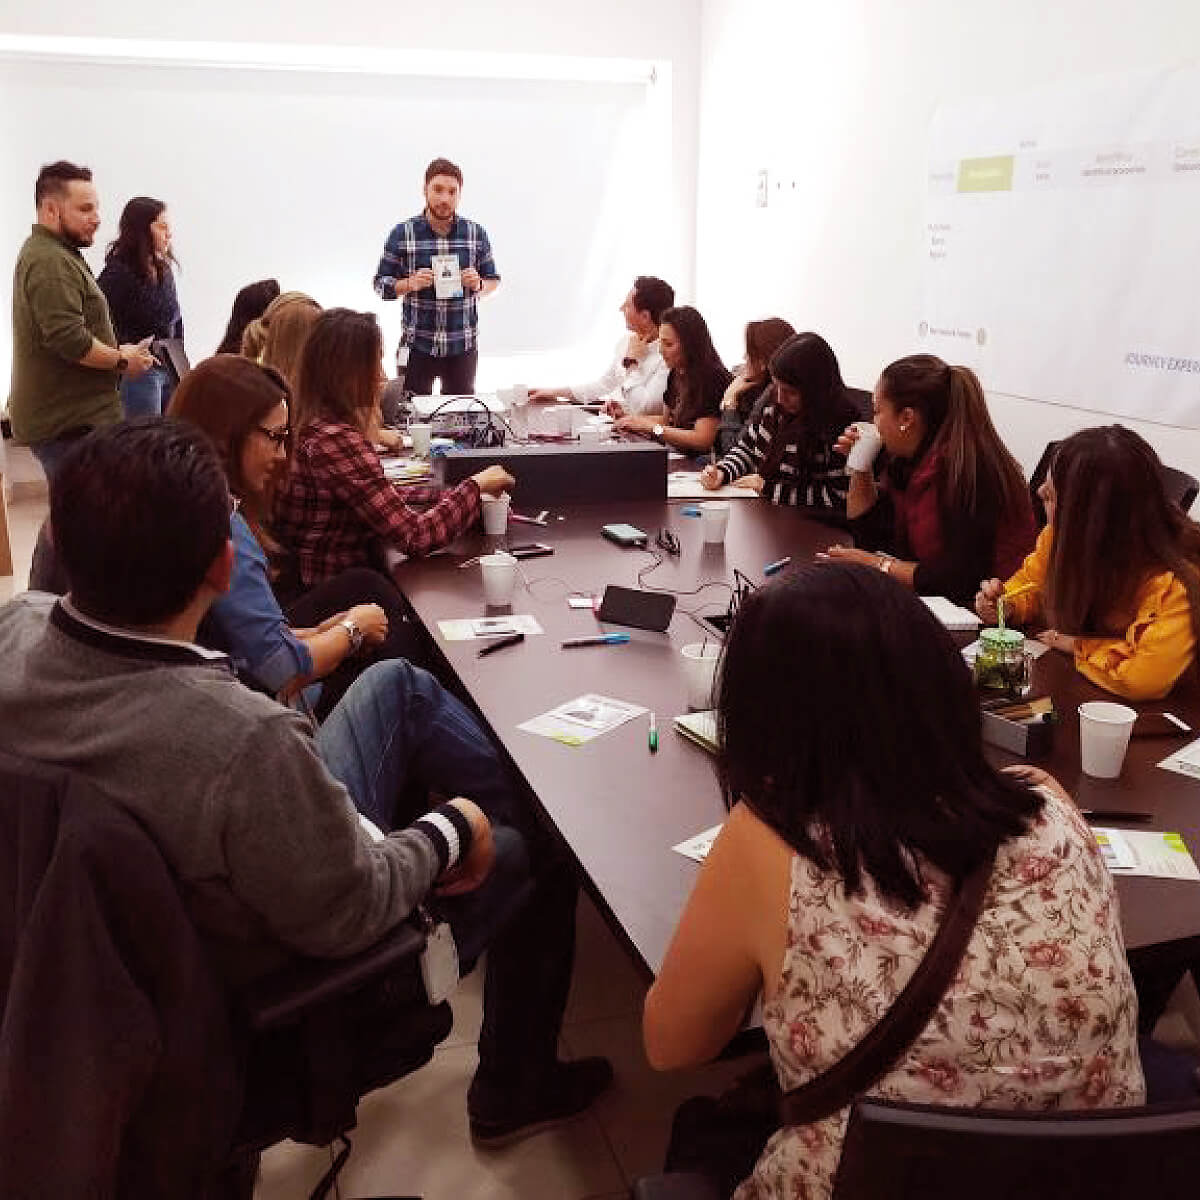 fotografia taller Banco Agrario Colombia por Imaginario 1